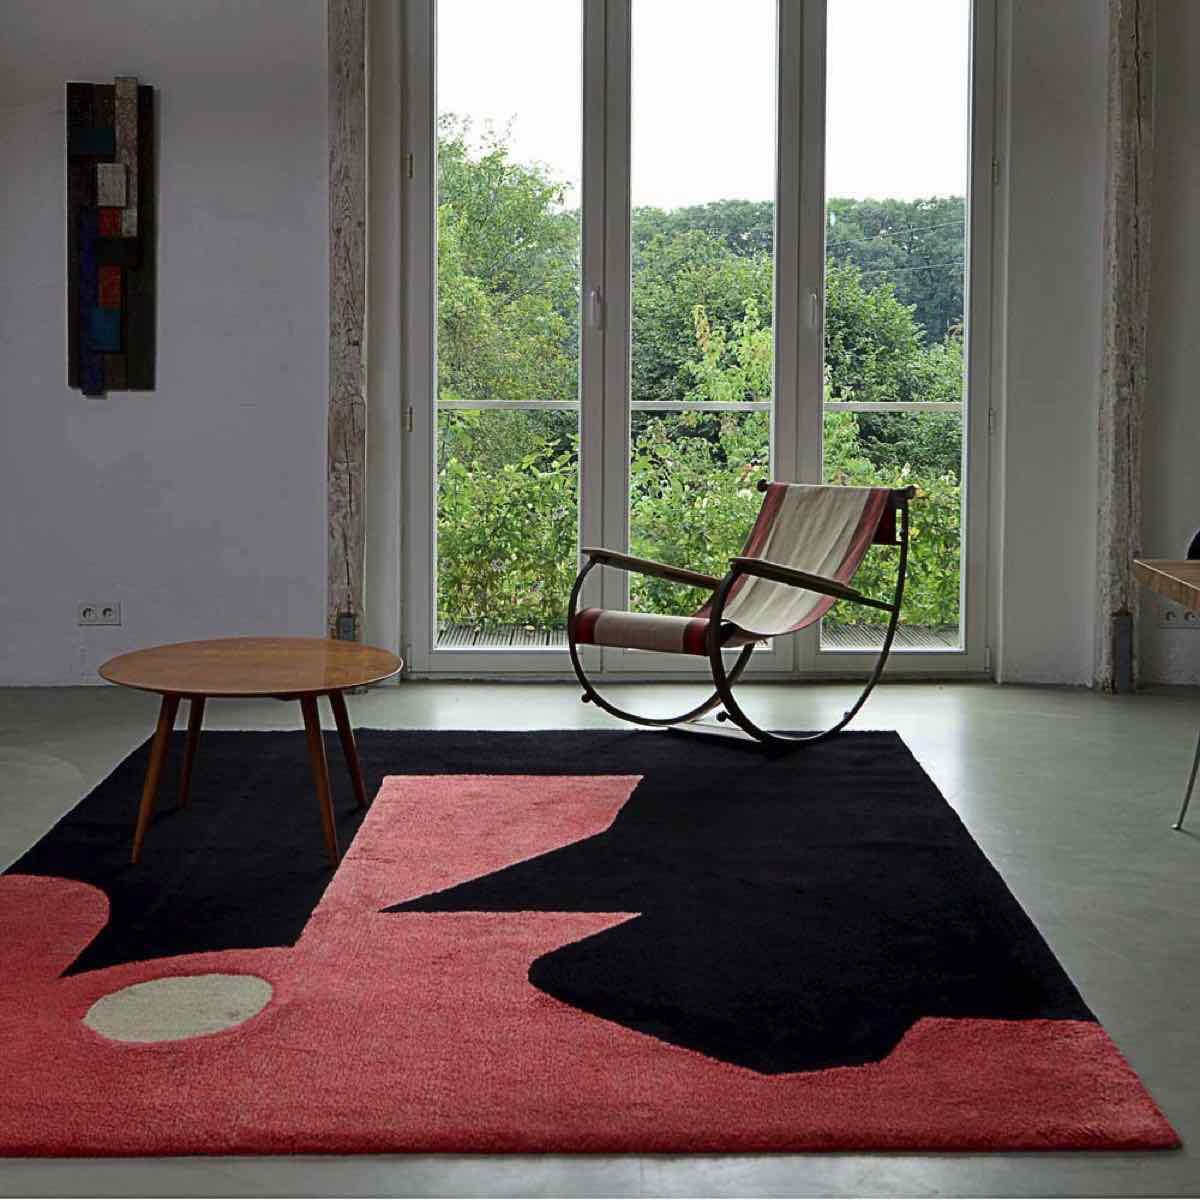 Ewald-Kroener-Teppich